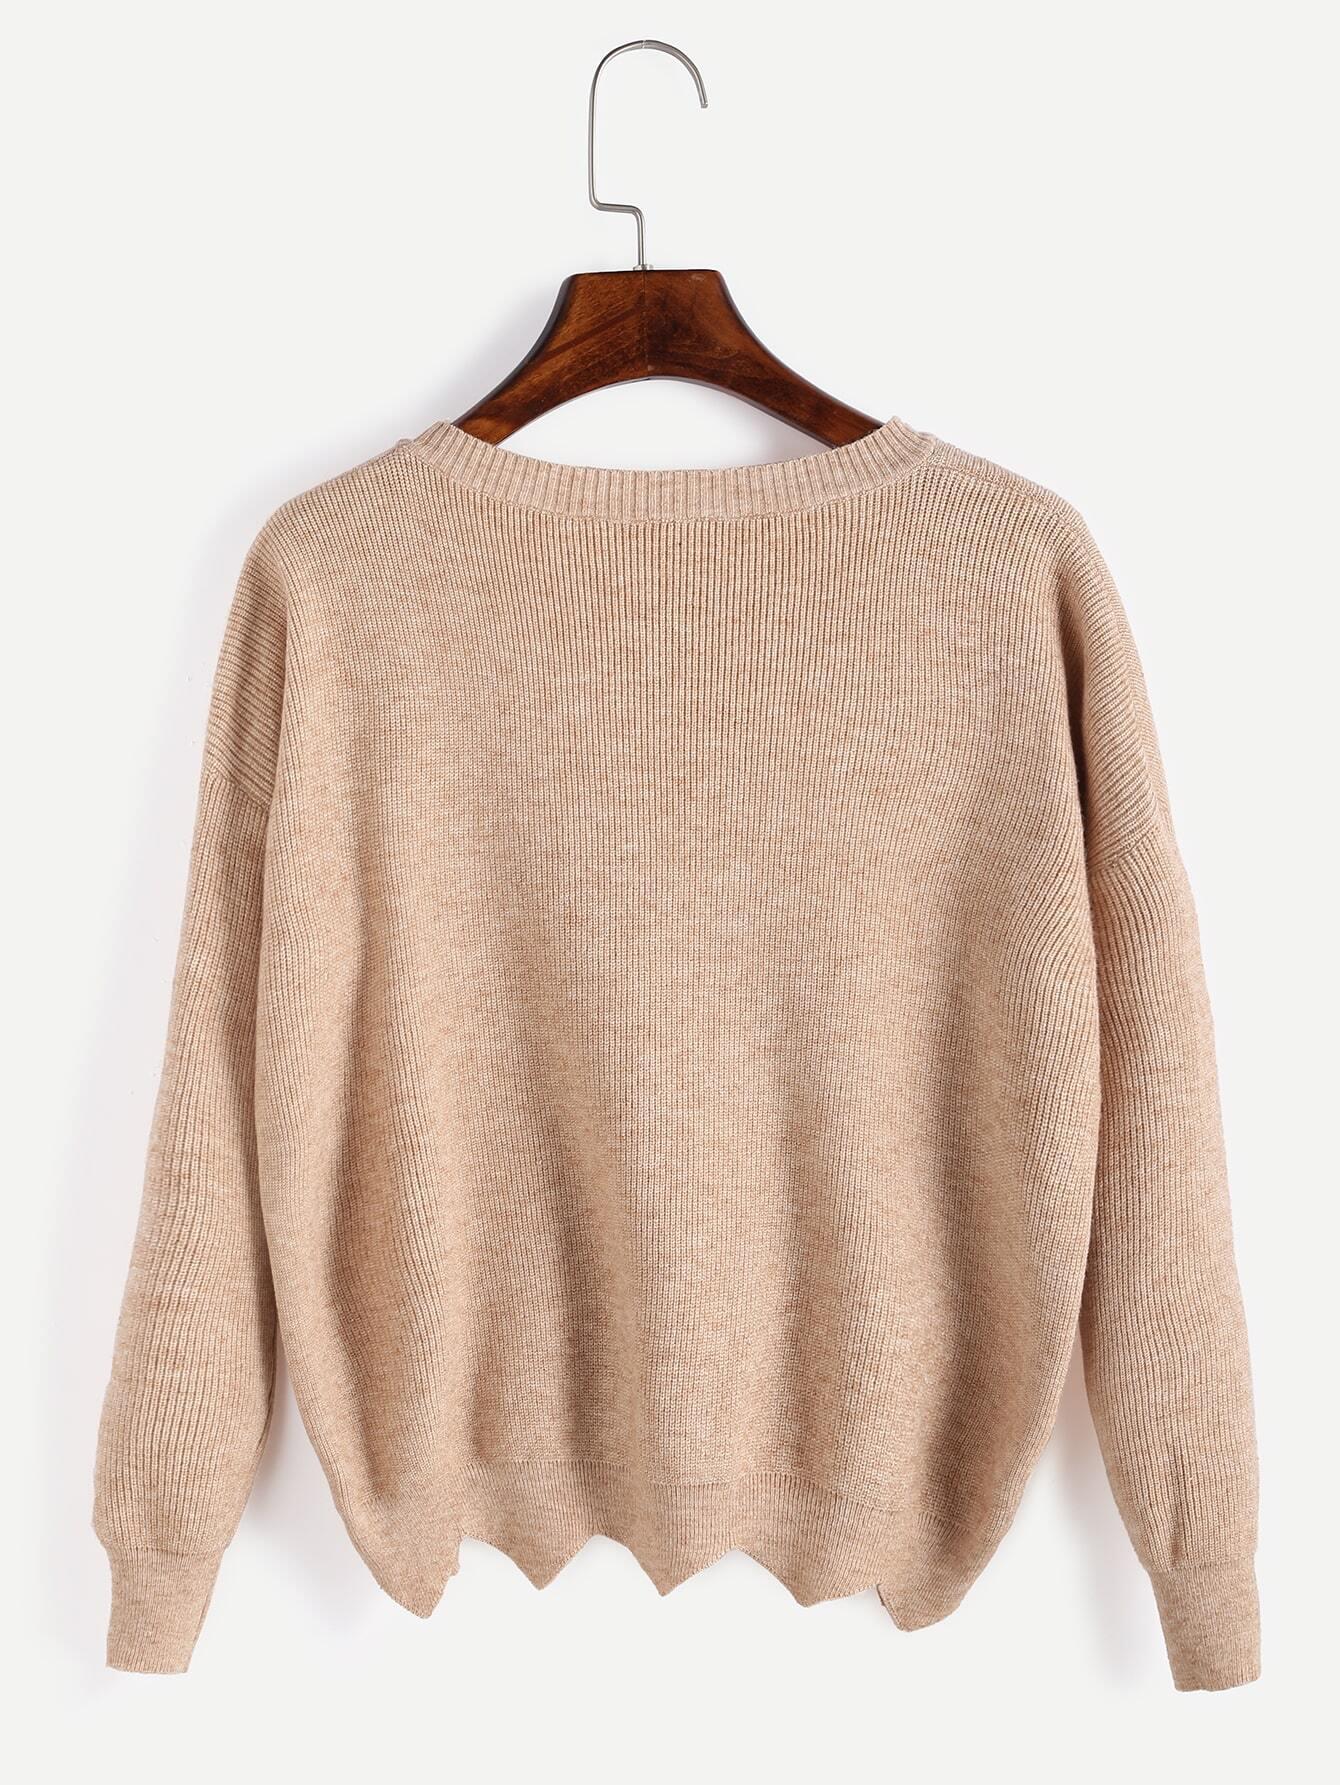 sweater160929001_2